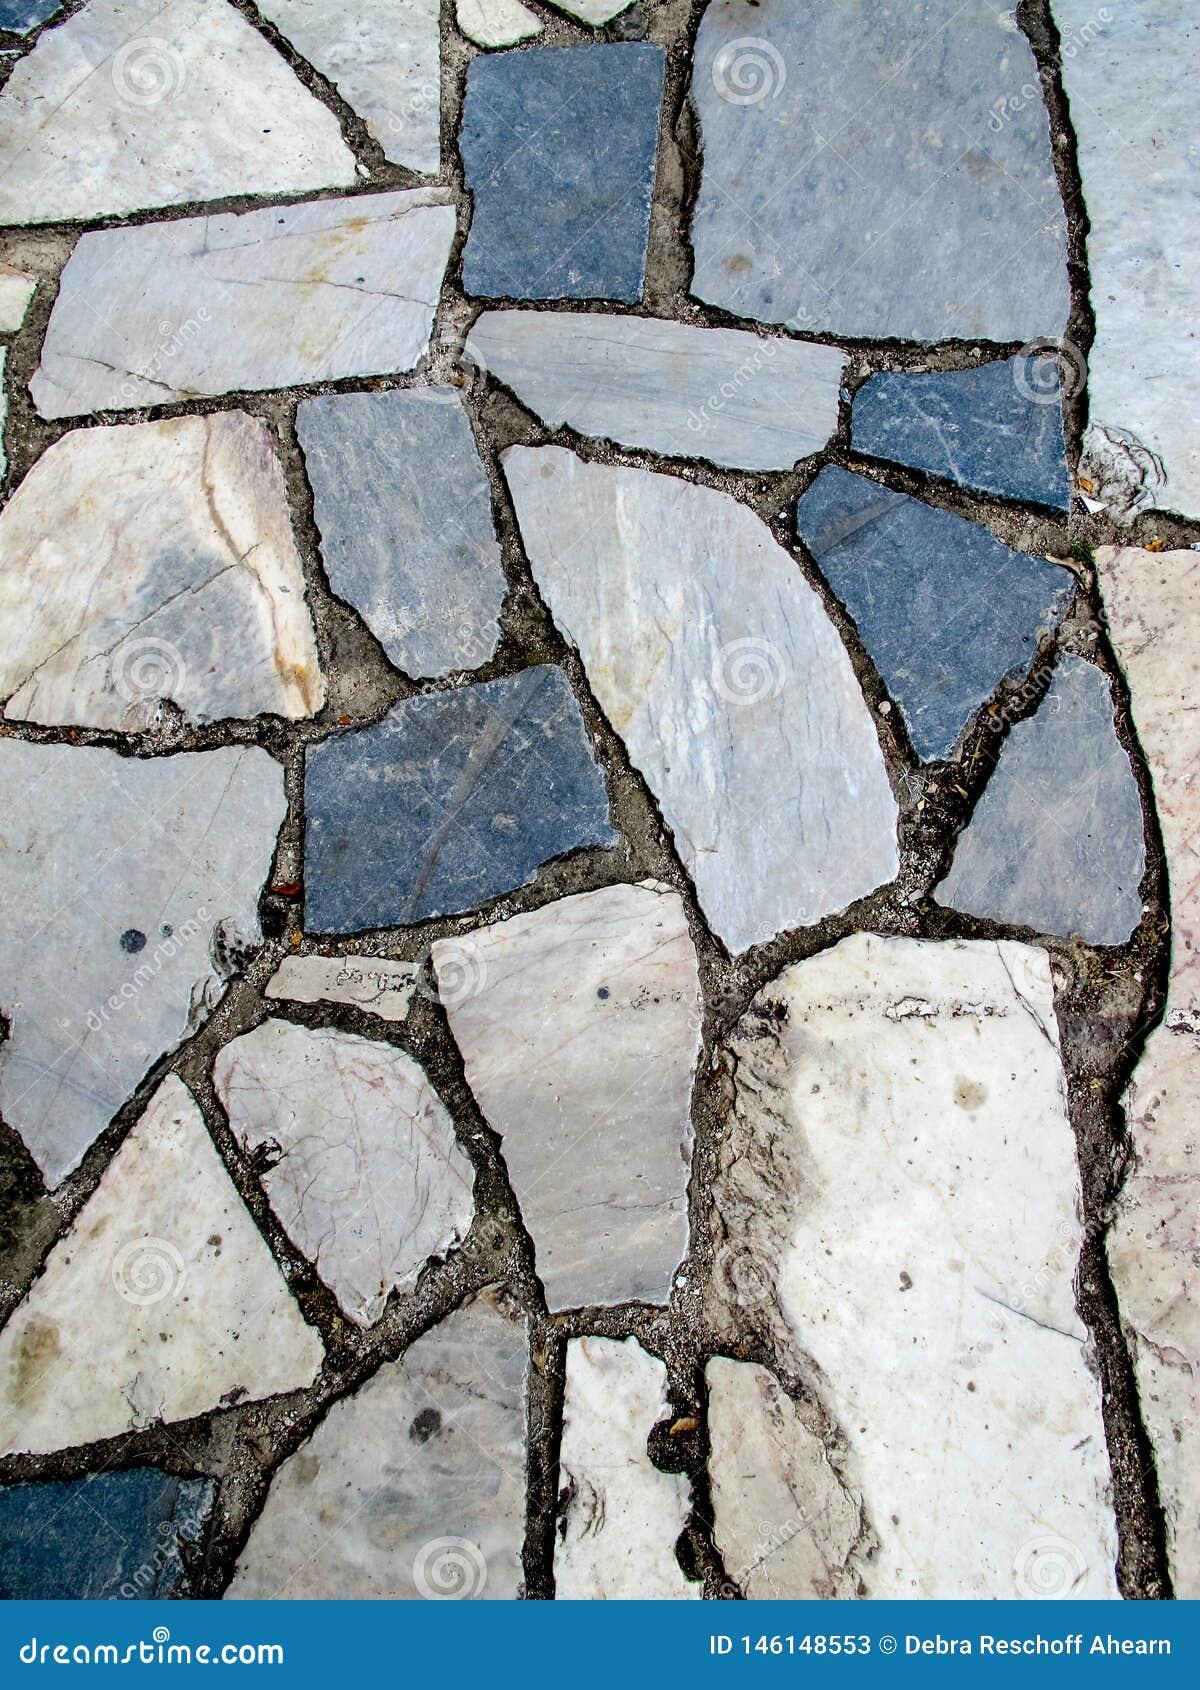 Blue Grey White cracked marble sidewalk pavement